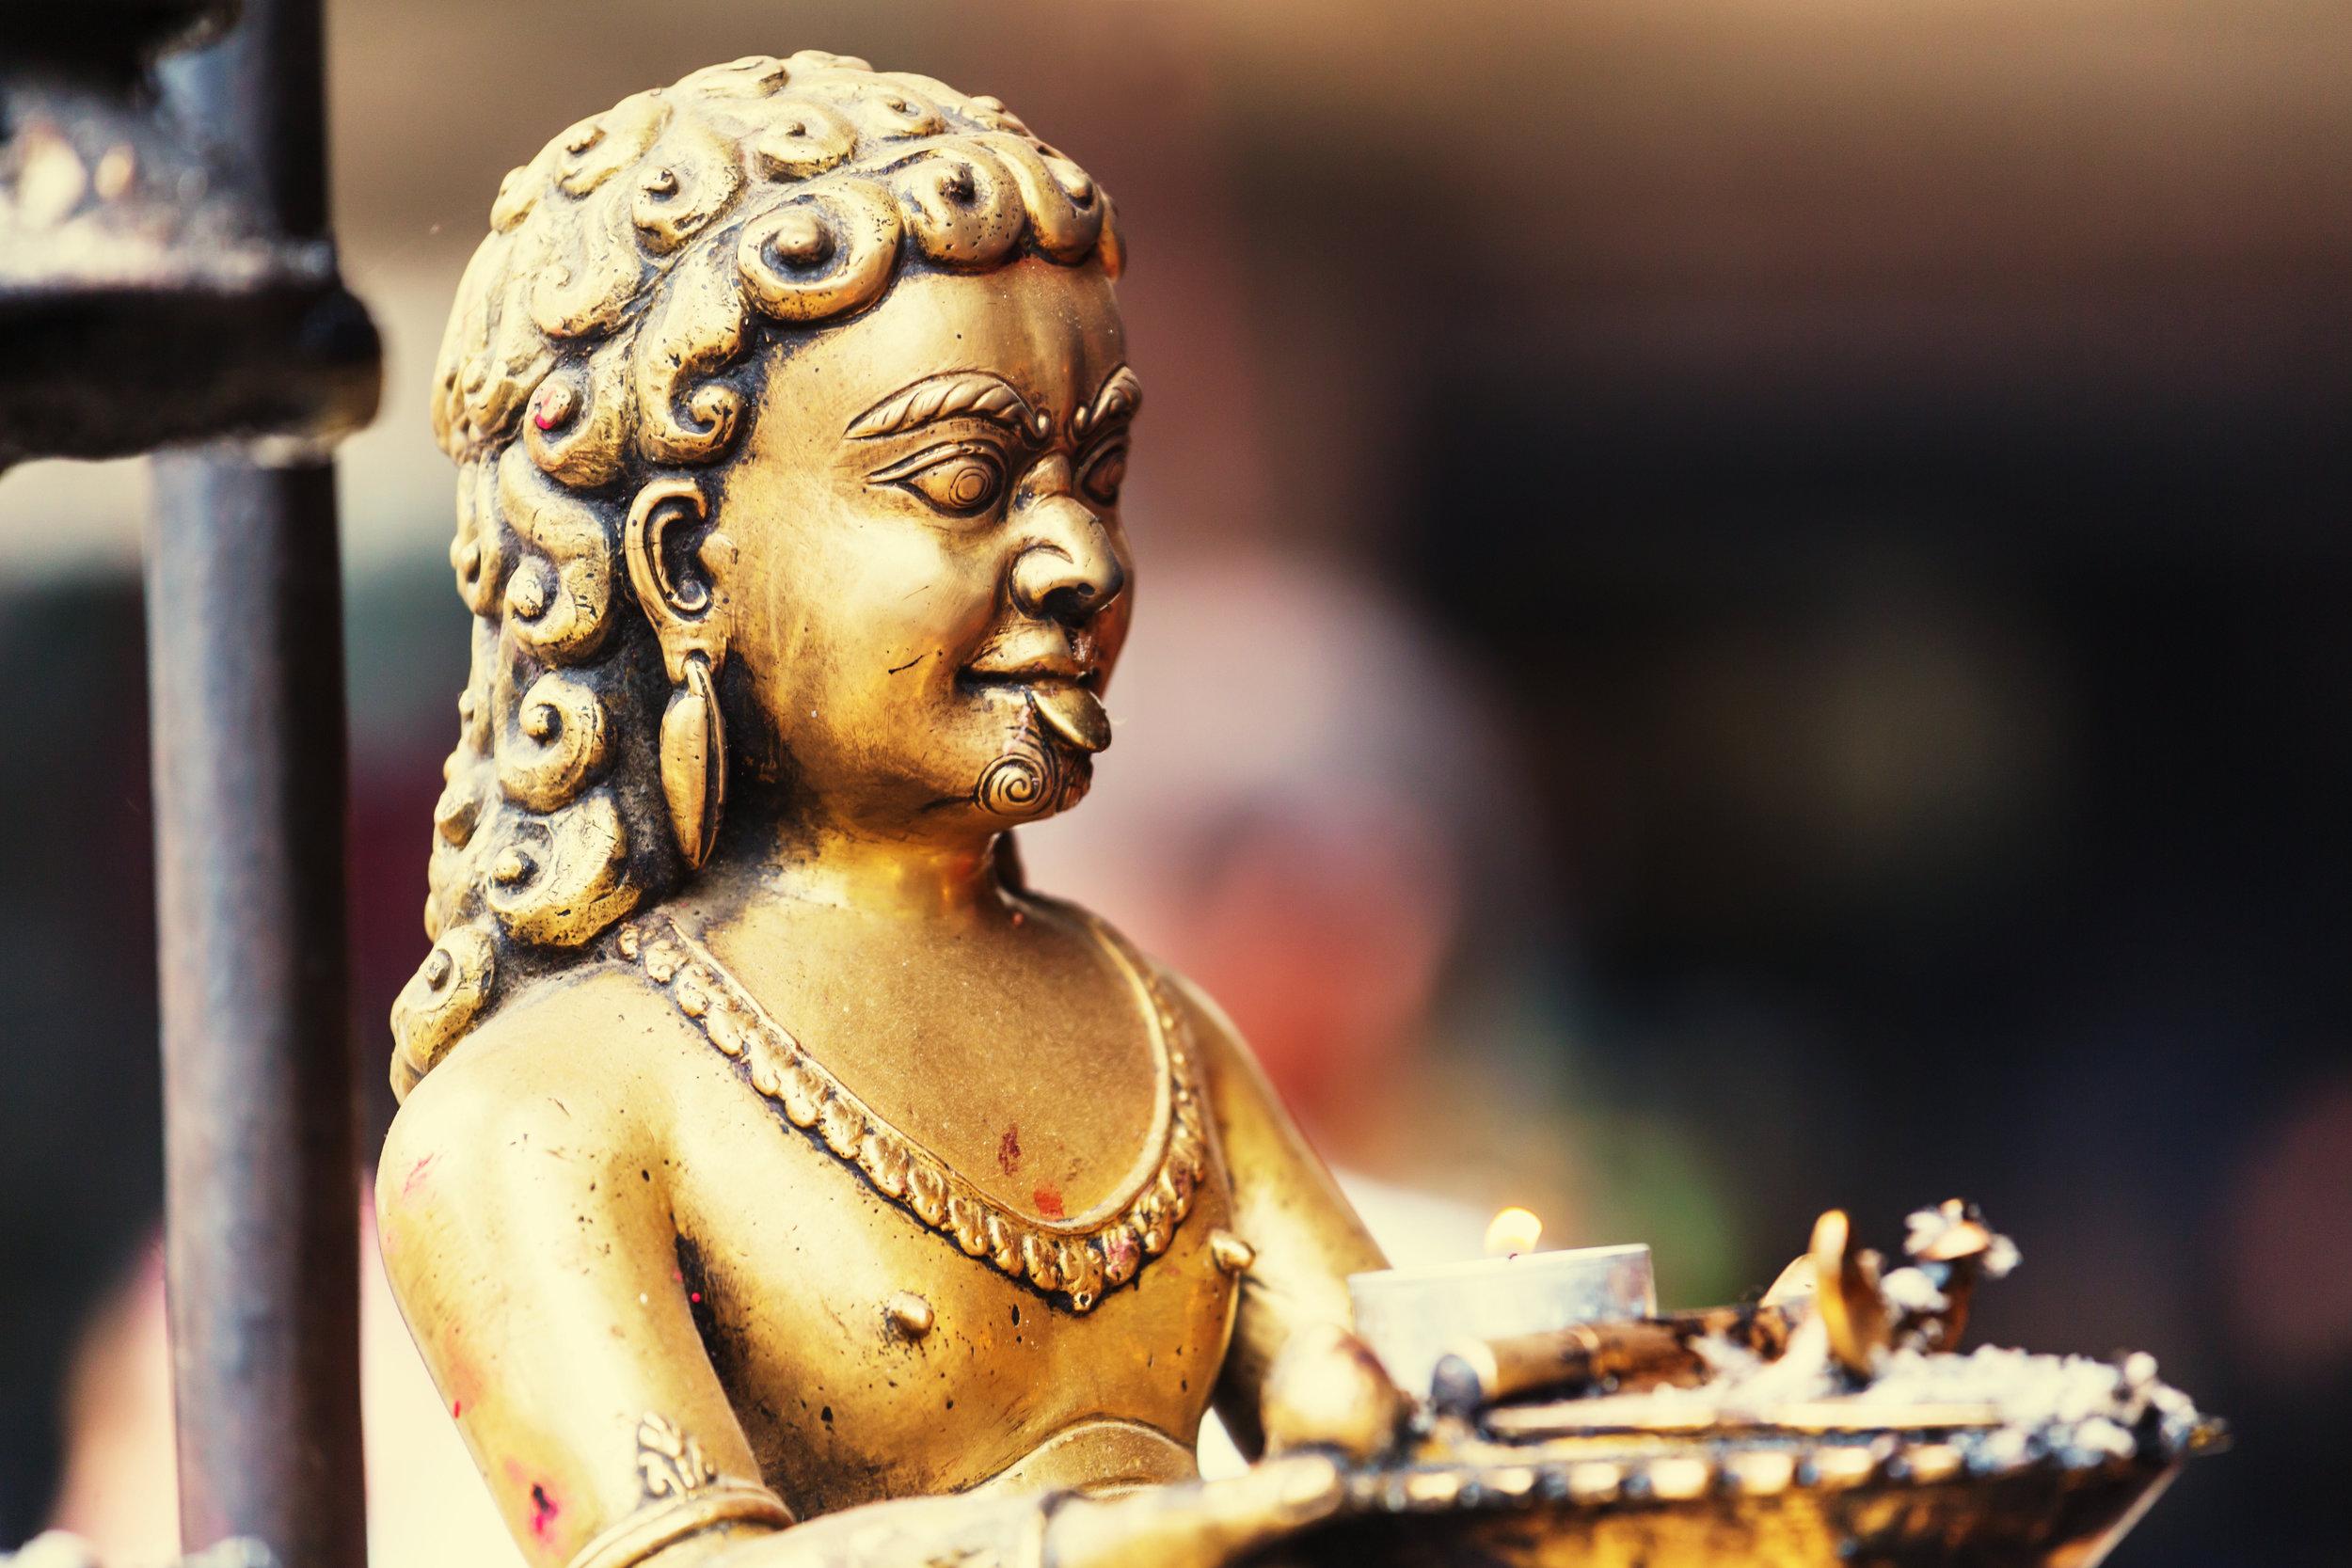 nepal_bigstock-Statue-in-Kathmandu-Nepal-130571075.jpg